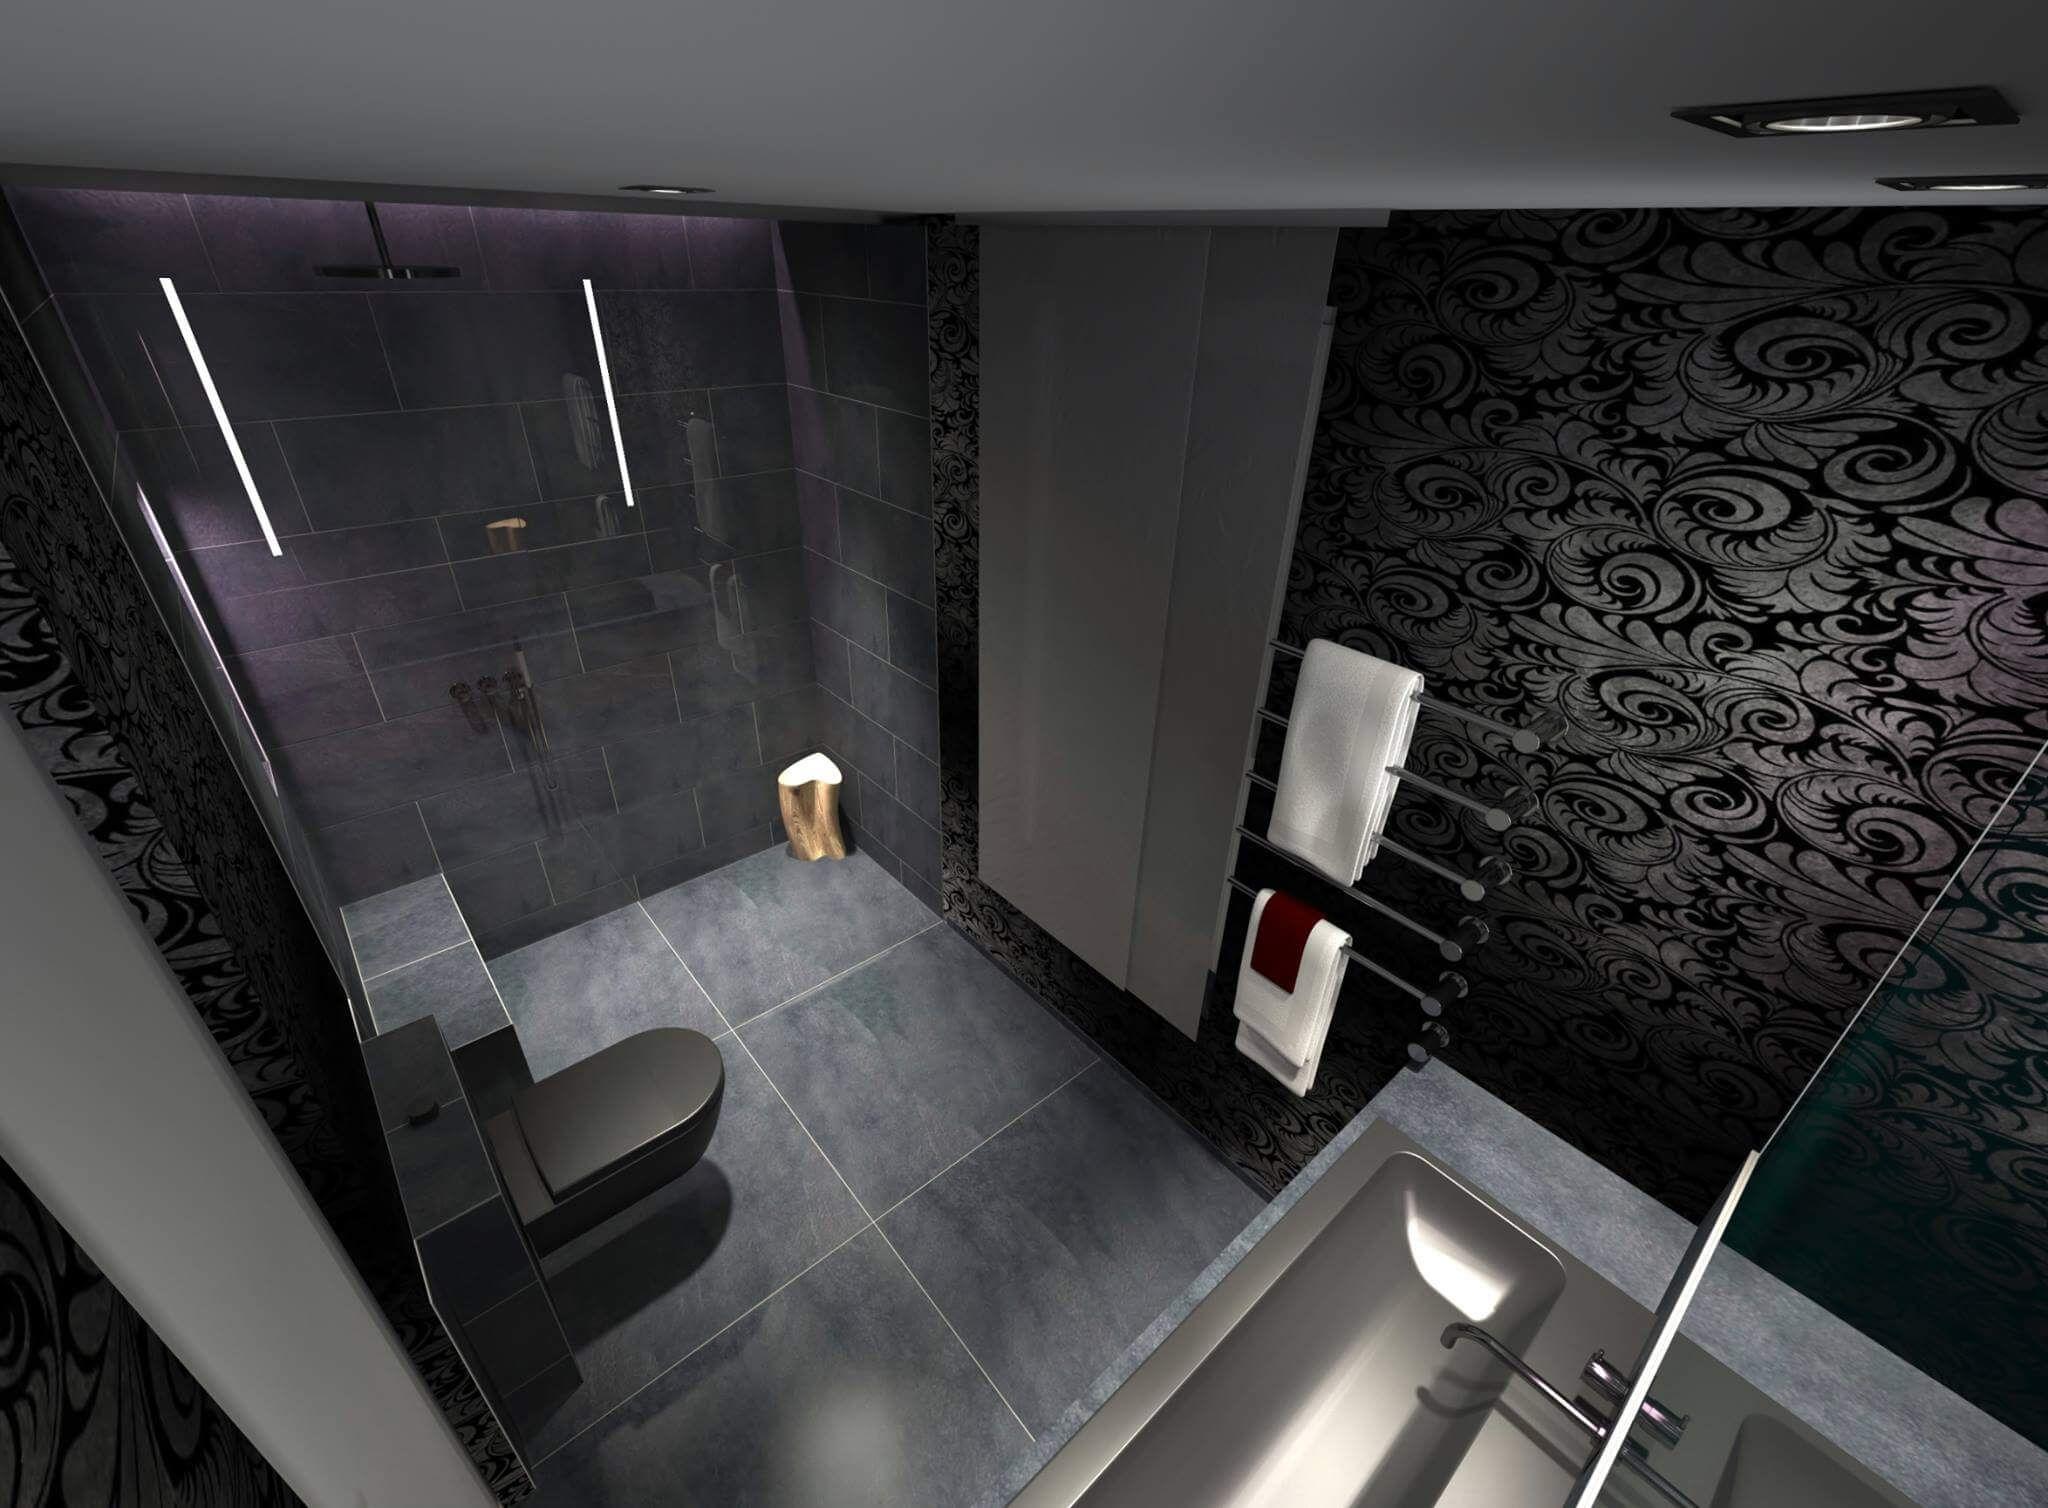 3d Badplanung Anfertigung Virtueller Badmodelle Badezimmer Design Badezimmer Bad Design